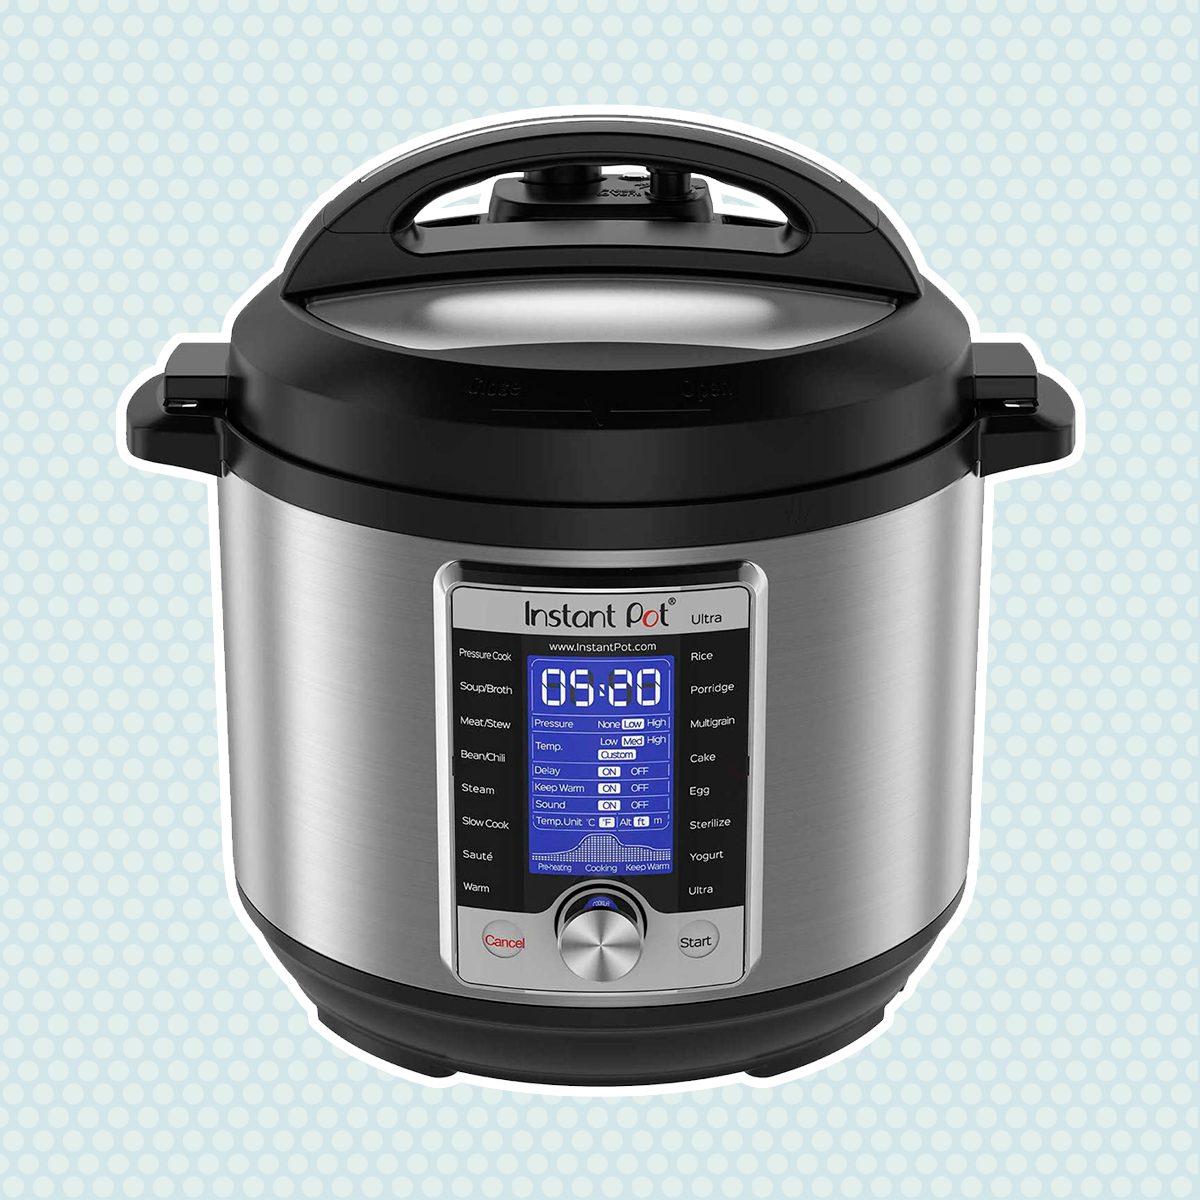 Instant Pot Ultra 10-in-1 Electric Pressure Cooker, Sterilizer, Slow Cooker, Rice Cooker, Steamer, Sauté, Yogurt Maker, Cake Maker, Egg Cooker, and Warmer, 6 Quart, 16 One-Touch Programs